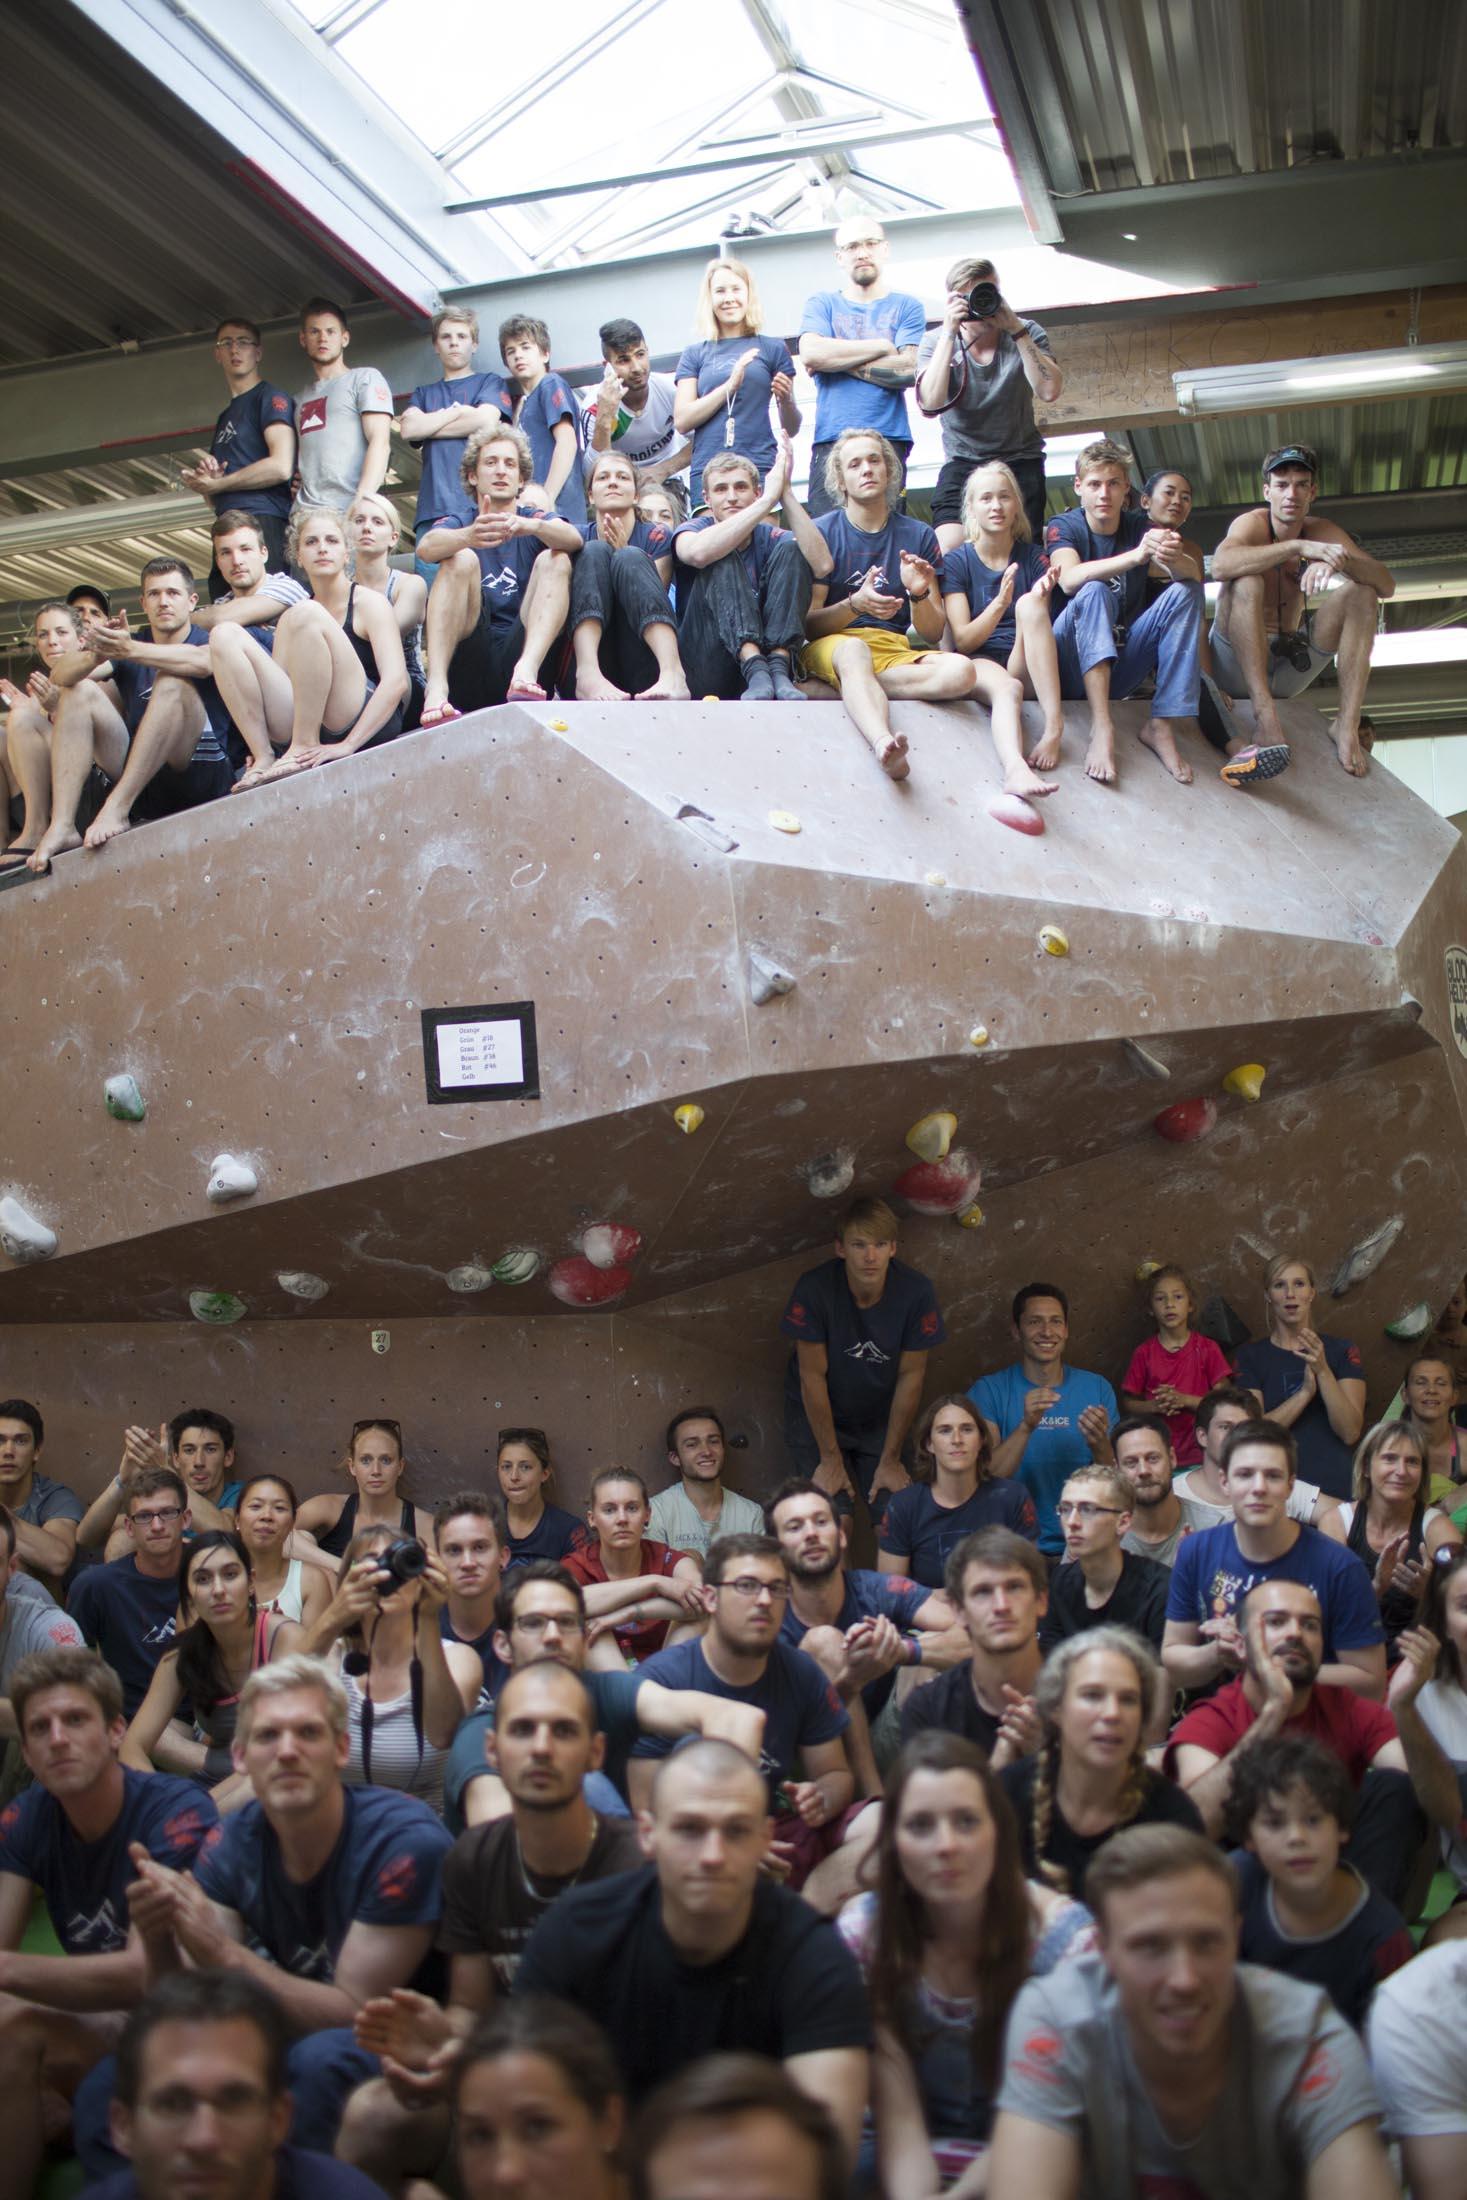 Finale, internationaler bouldercup Frankenjura 2016, BLOCKHELDEN Erlangen, Mammut, Bergfreunde.de, Boulderwettkampf07092016491